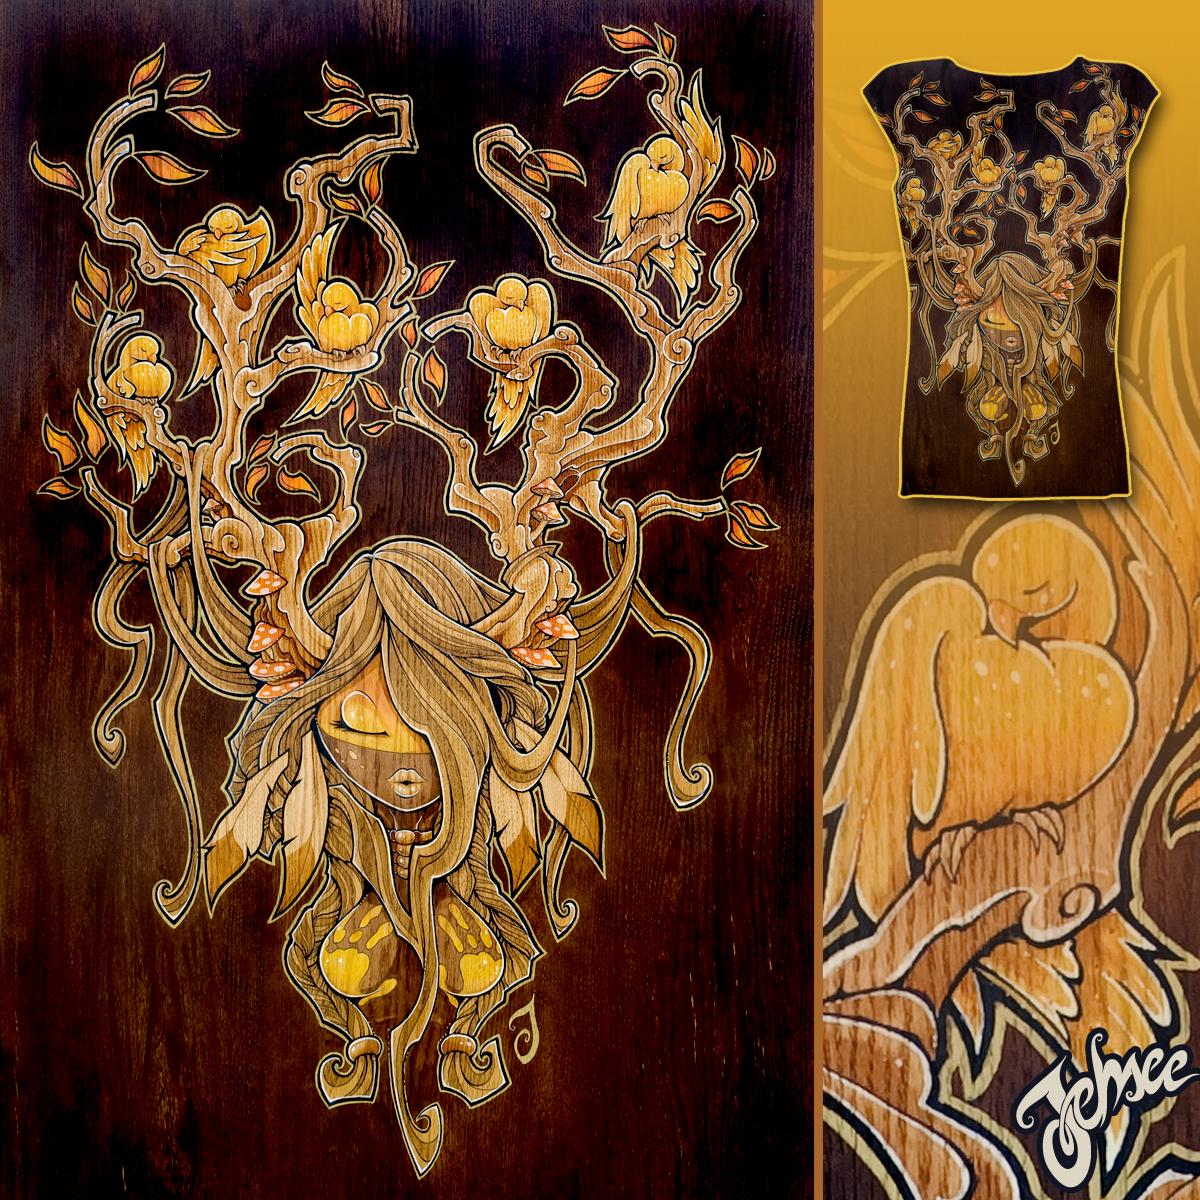 Awinita by Jehsee on Threadless